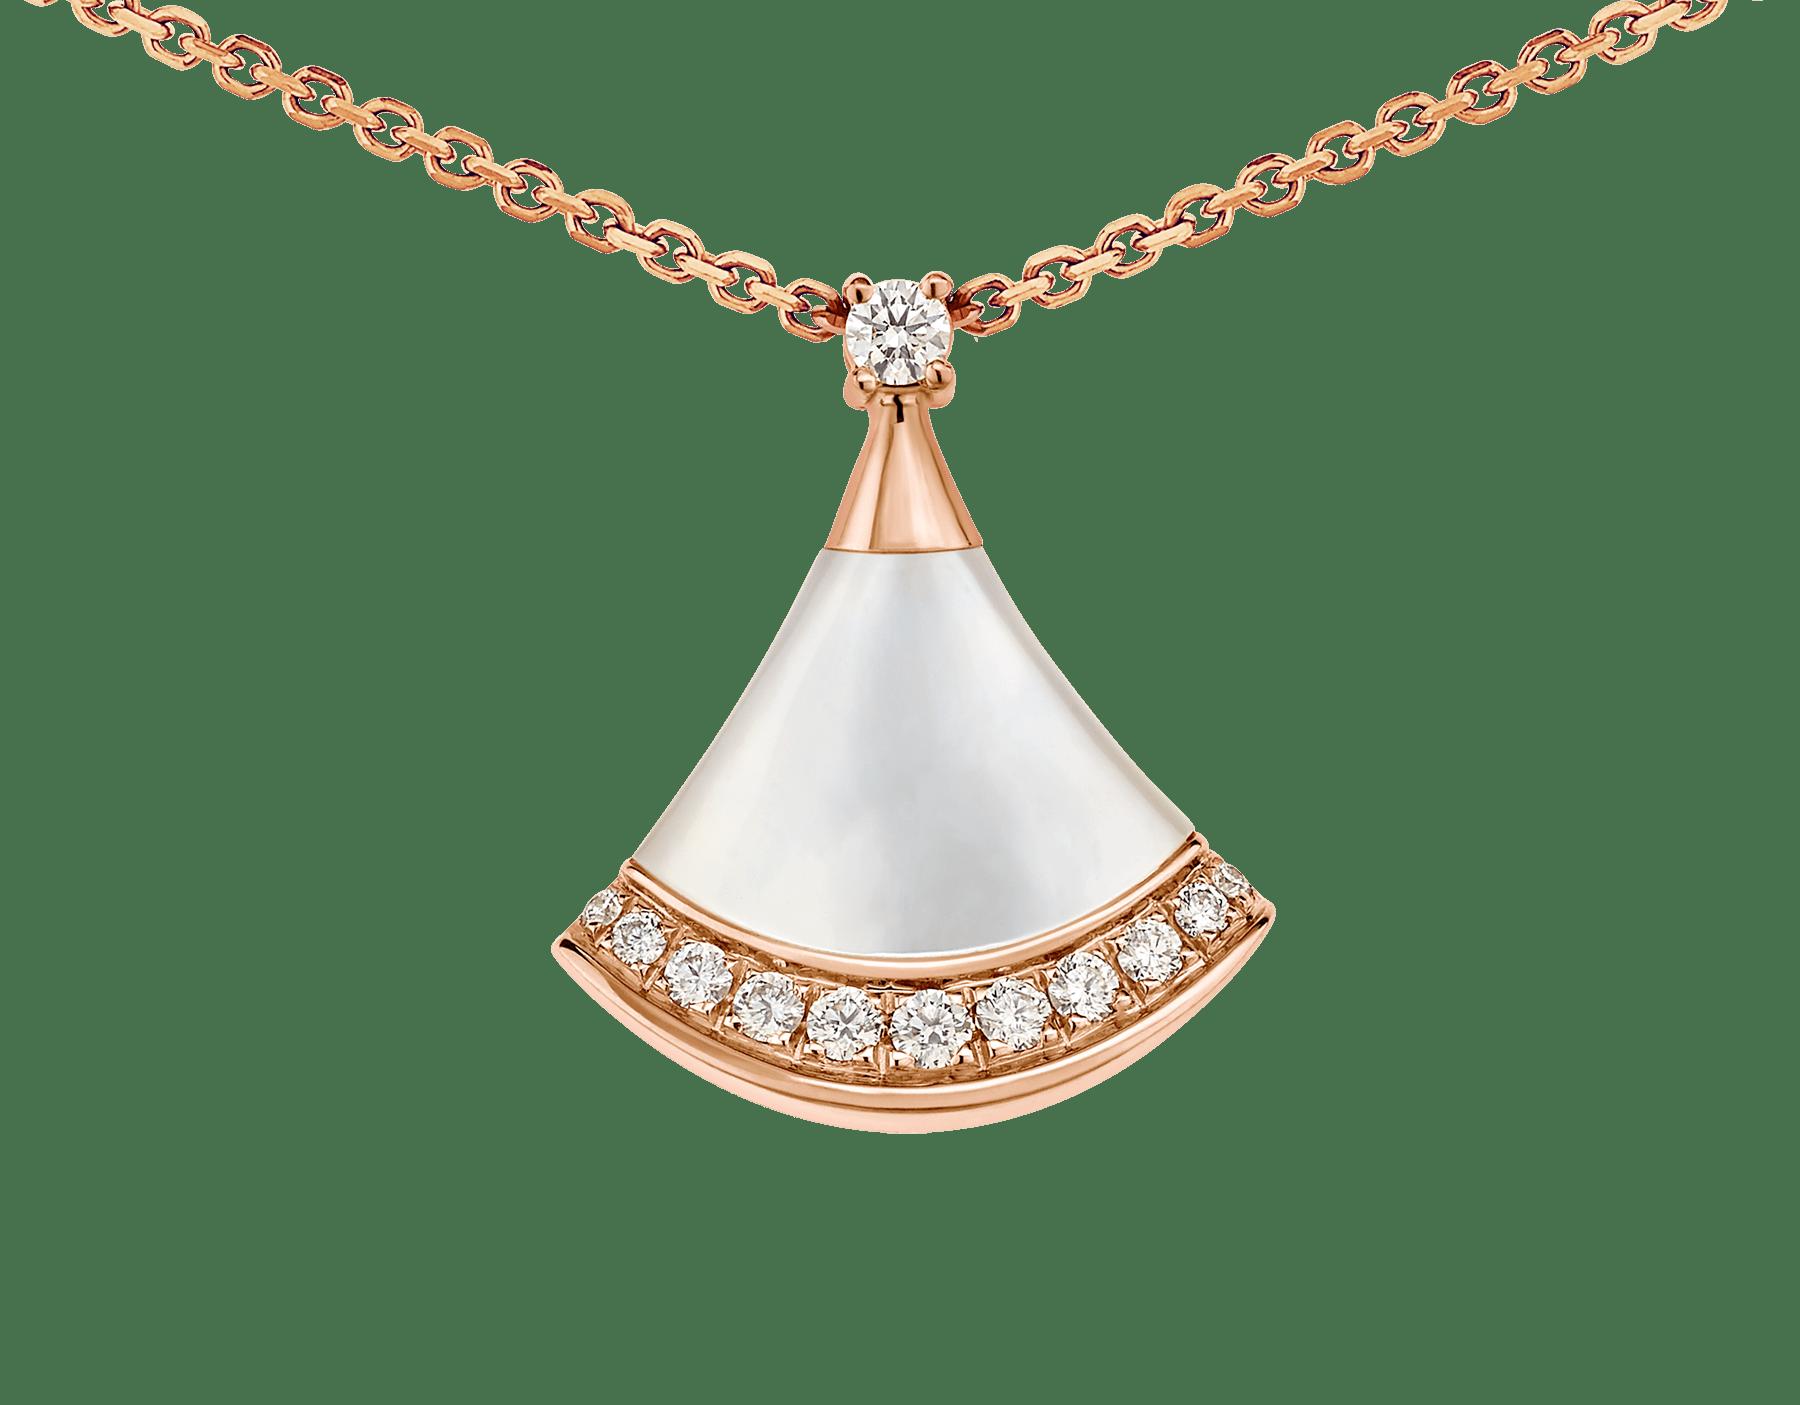 DIVAS' DREAM 18K 玫瑰金項鍊,鑲飾 1 顆鑽石(0.03 克拉)、珍珠母貝和密鑲鑽石(0.10 克拉)。 358365 image 3